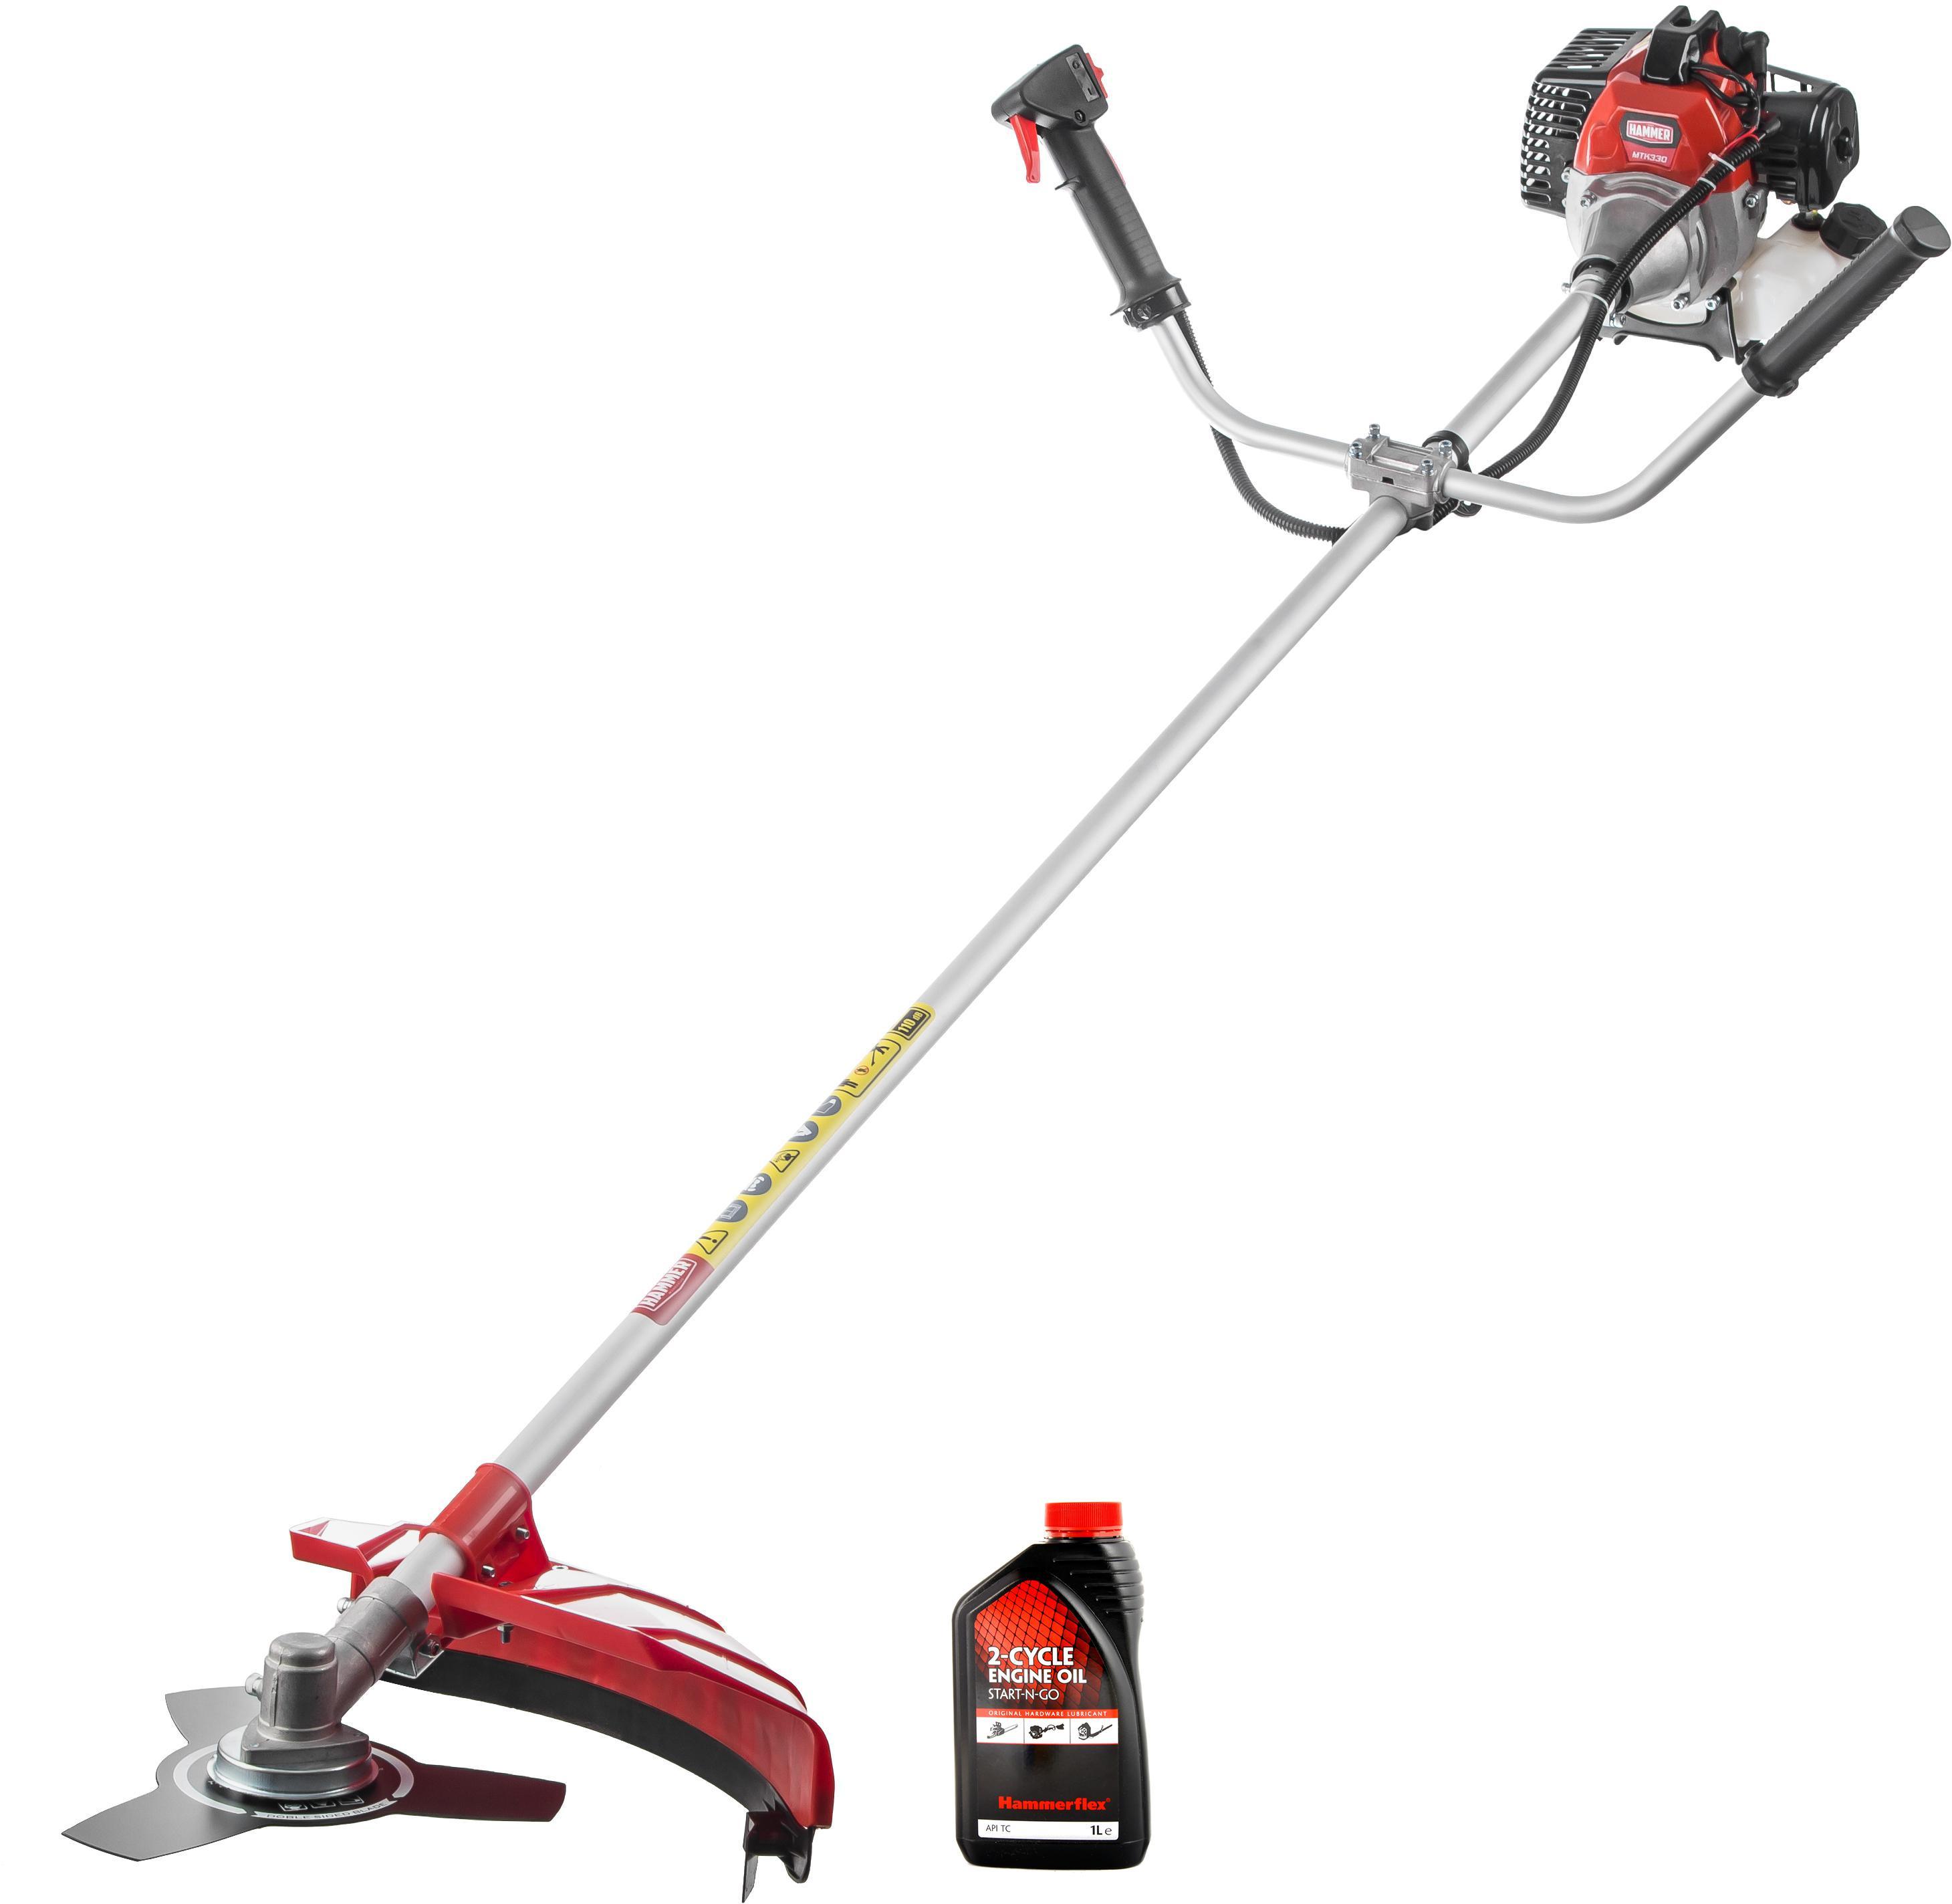 мотокоса hammer mtk330 красный черный серый Набор Hammer Мотокоса mtk330 +Масло моторное 501-001